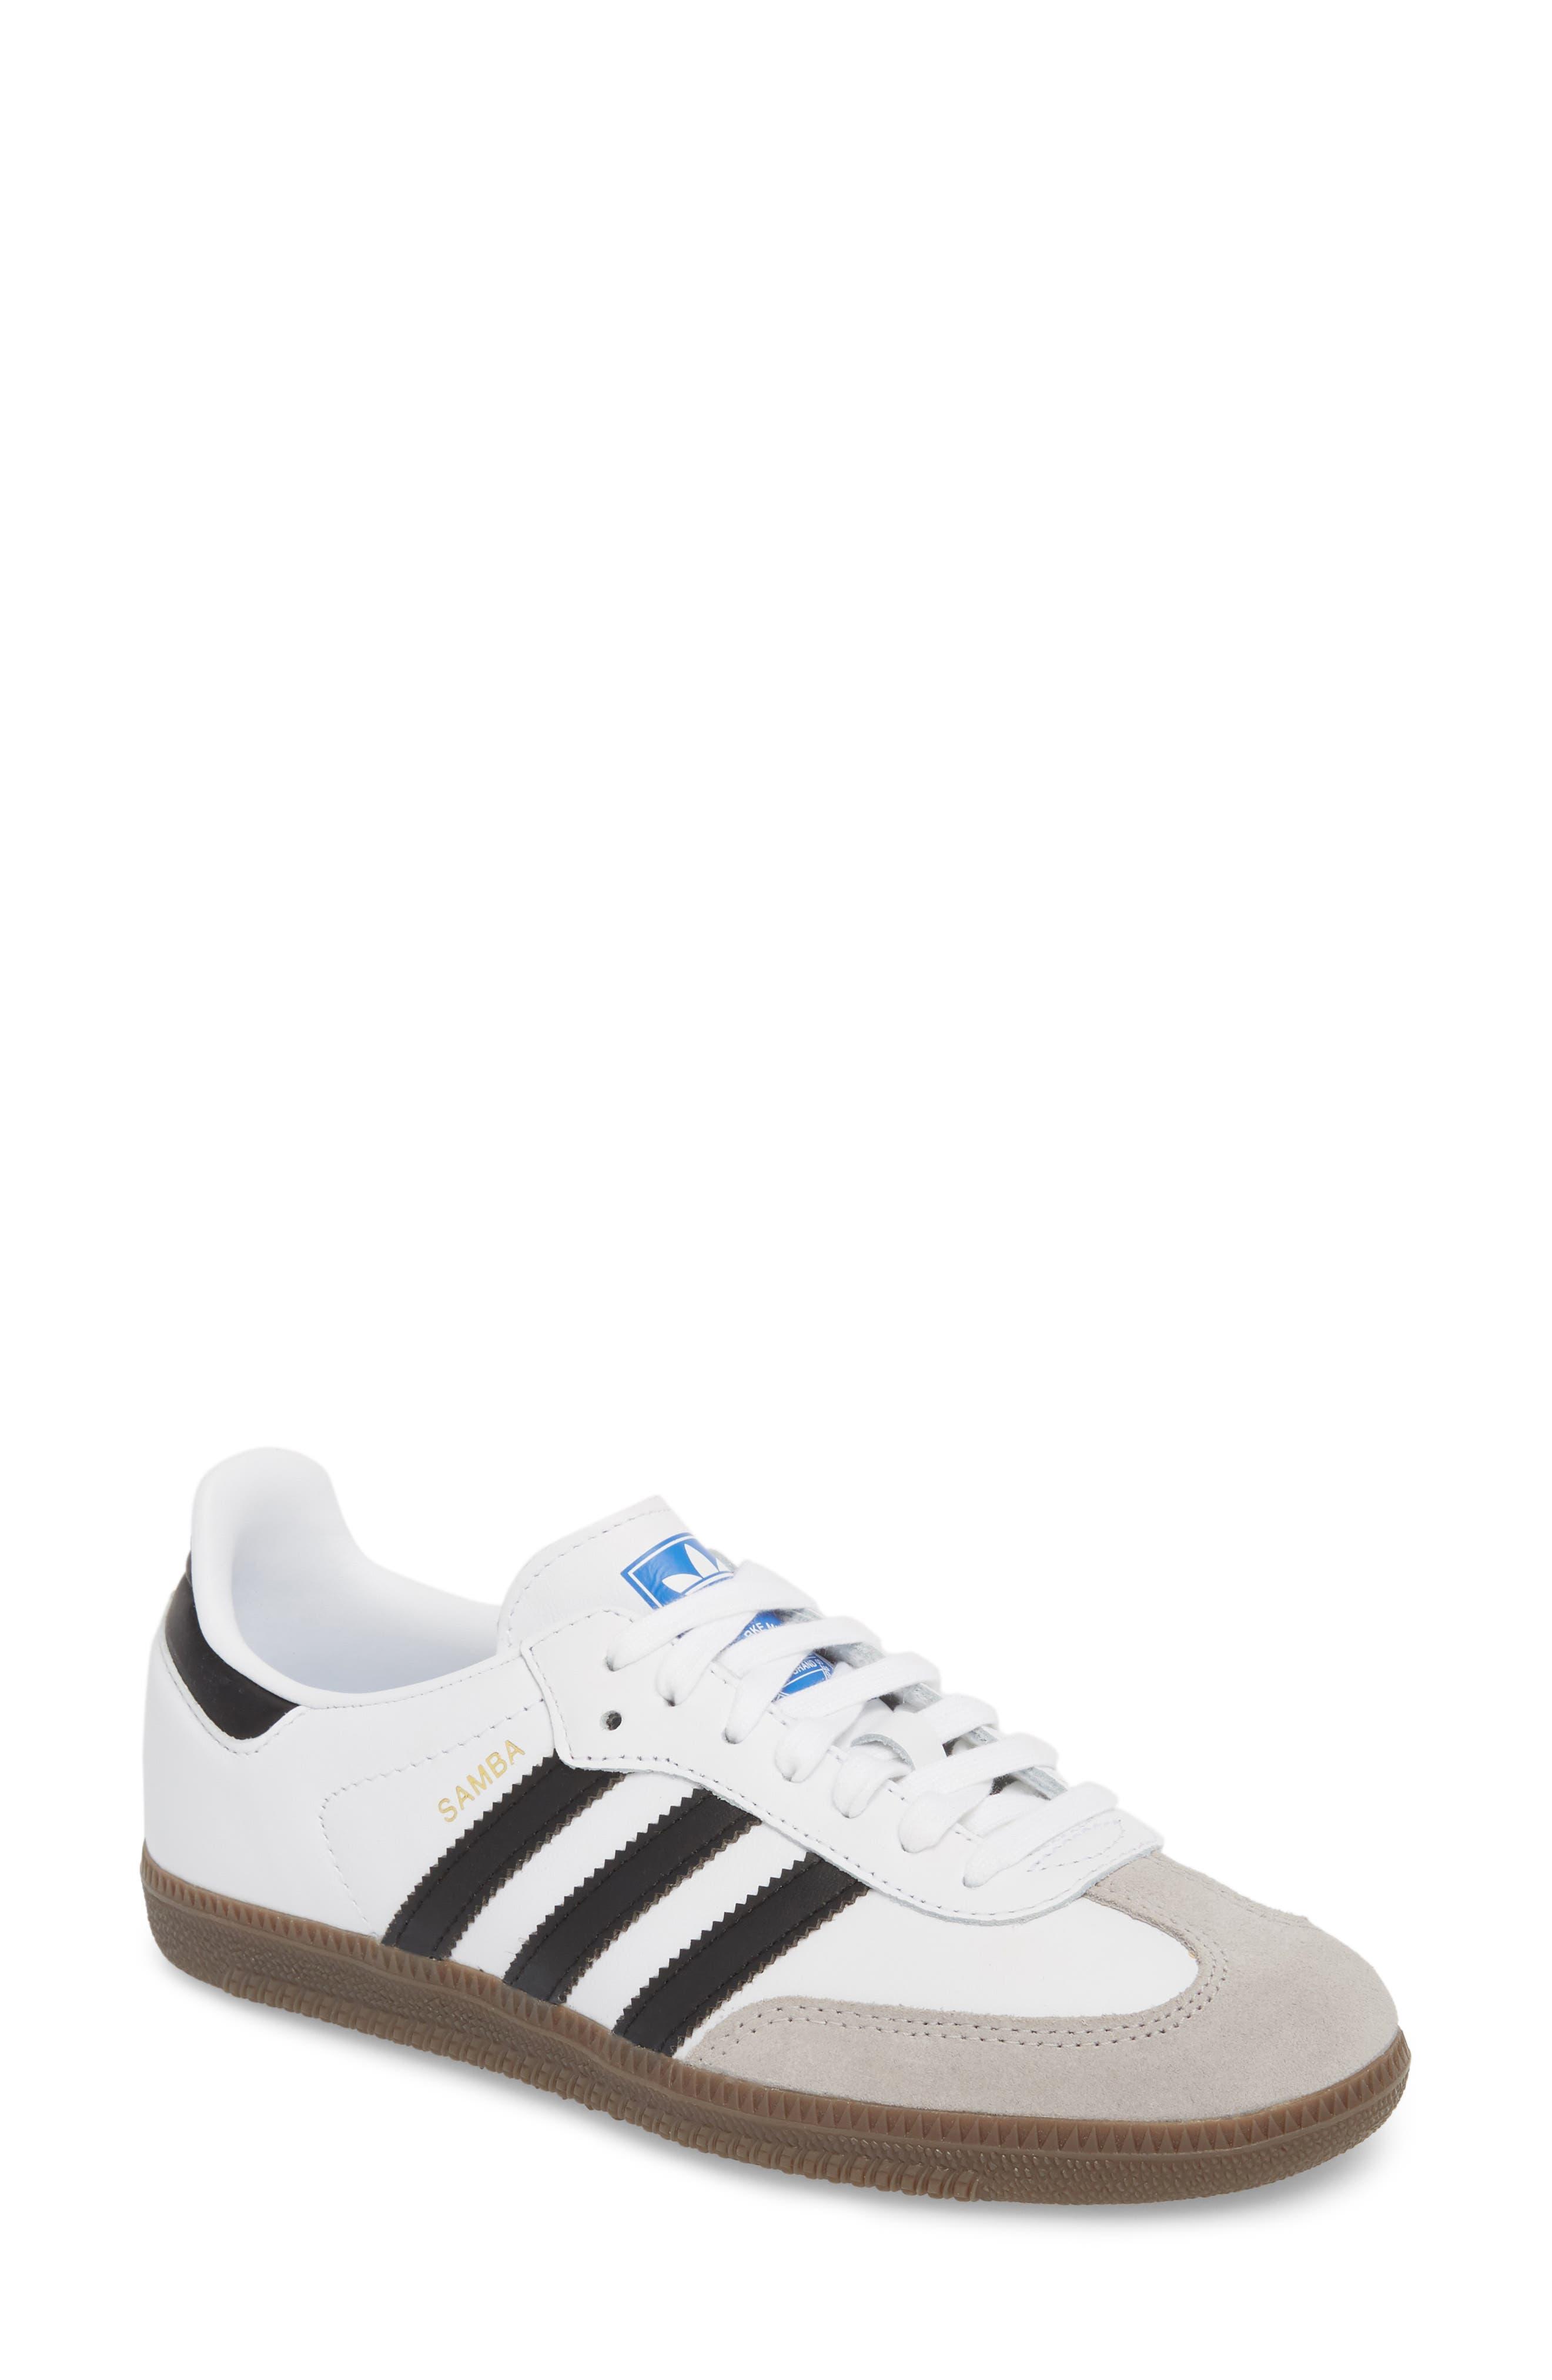 'Samba' Sneaker,                             Main thumbnail 1, color,                             White/ Black/ Clear Granite